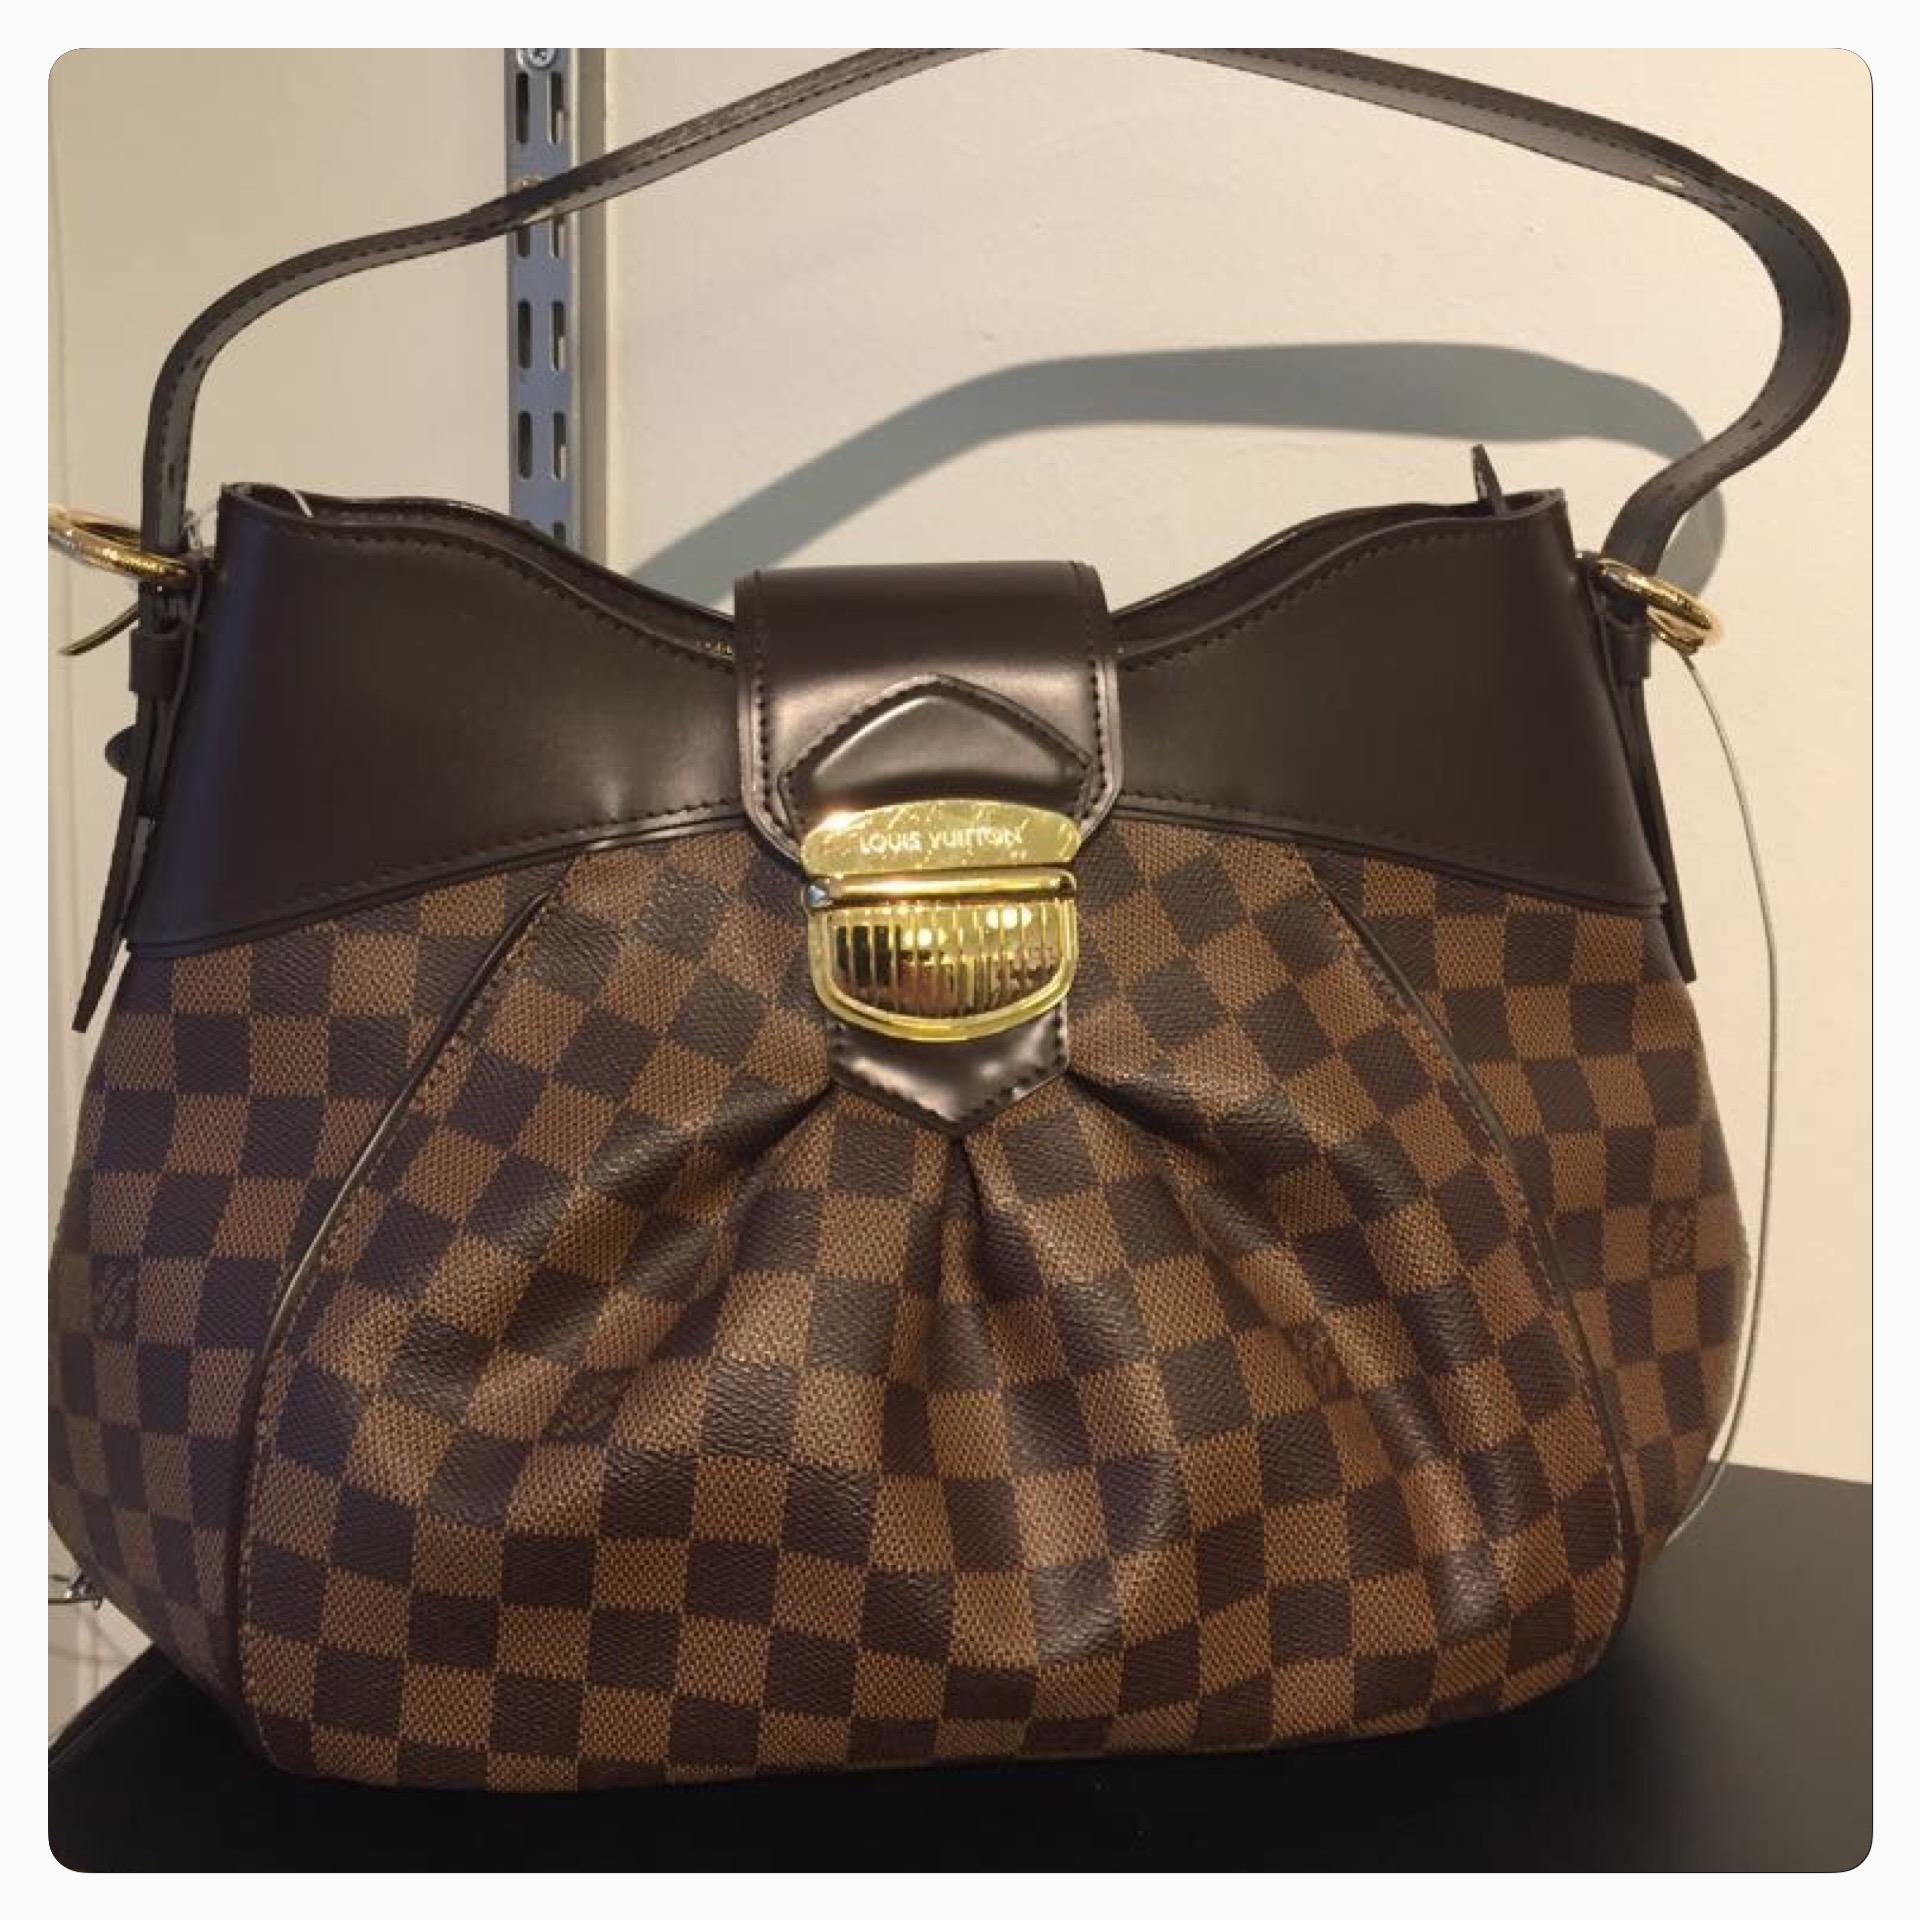 Louis Vuitton Sistina Damier Väska